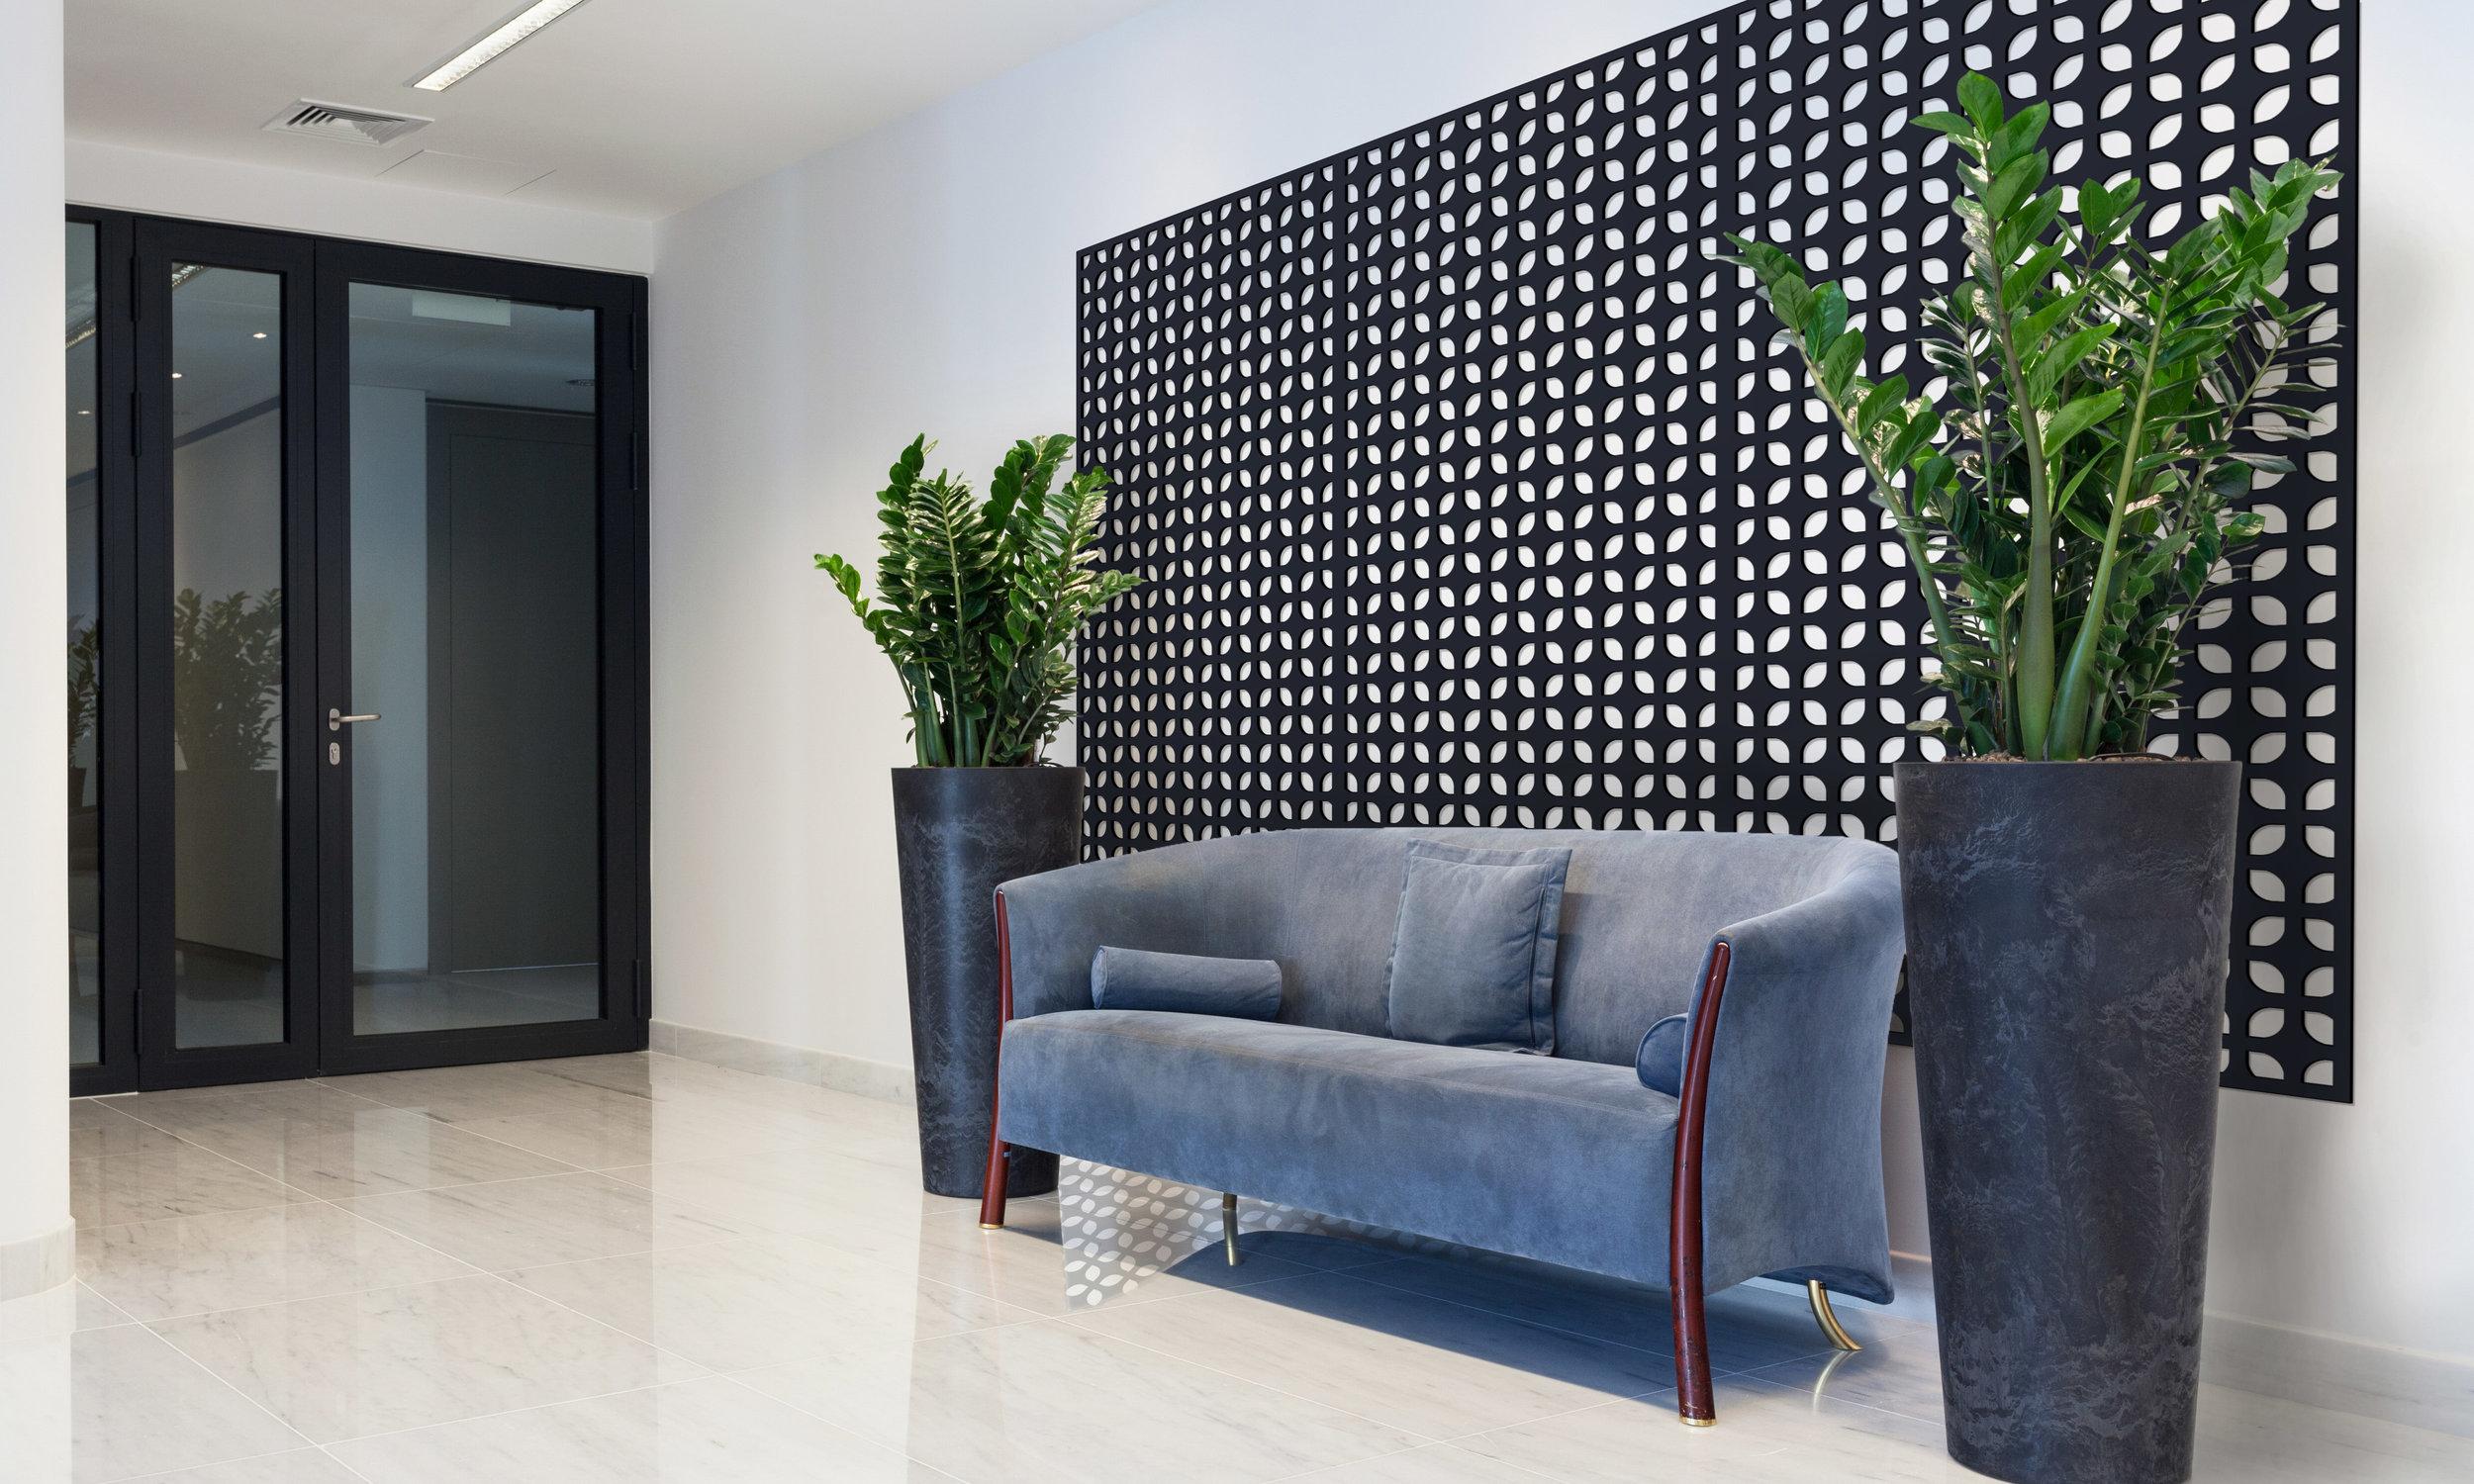 Installation Rendering B   Copenhagan decorative office wall panel - painted